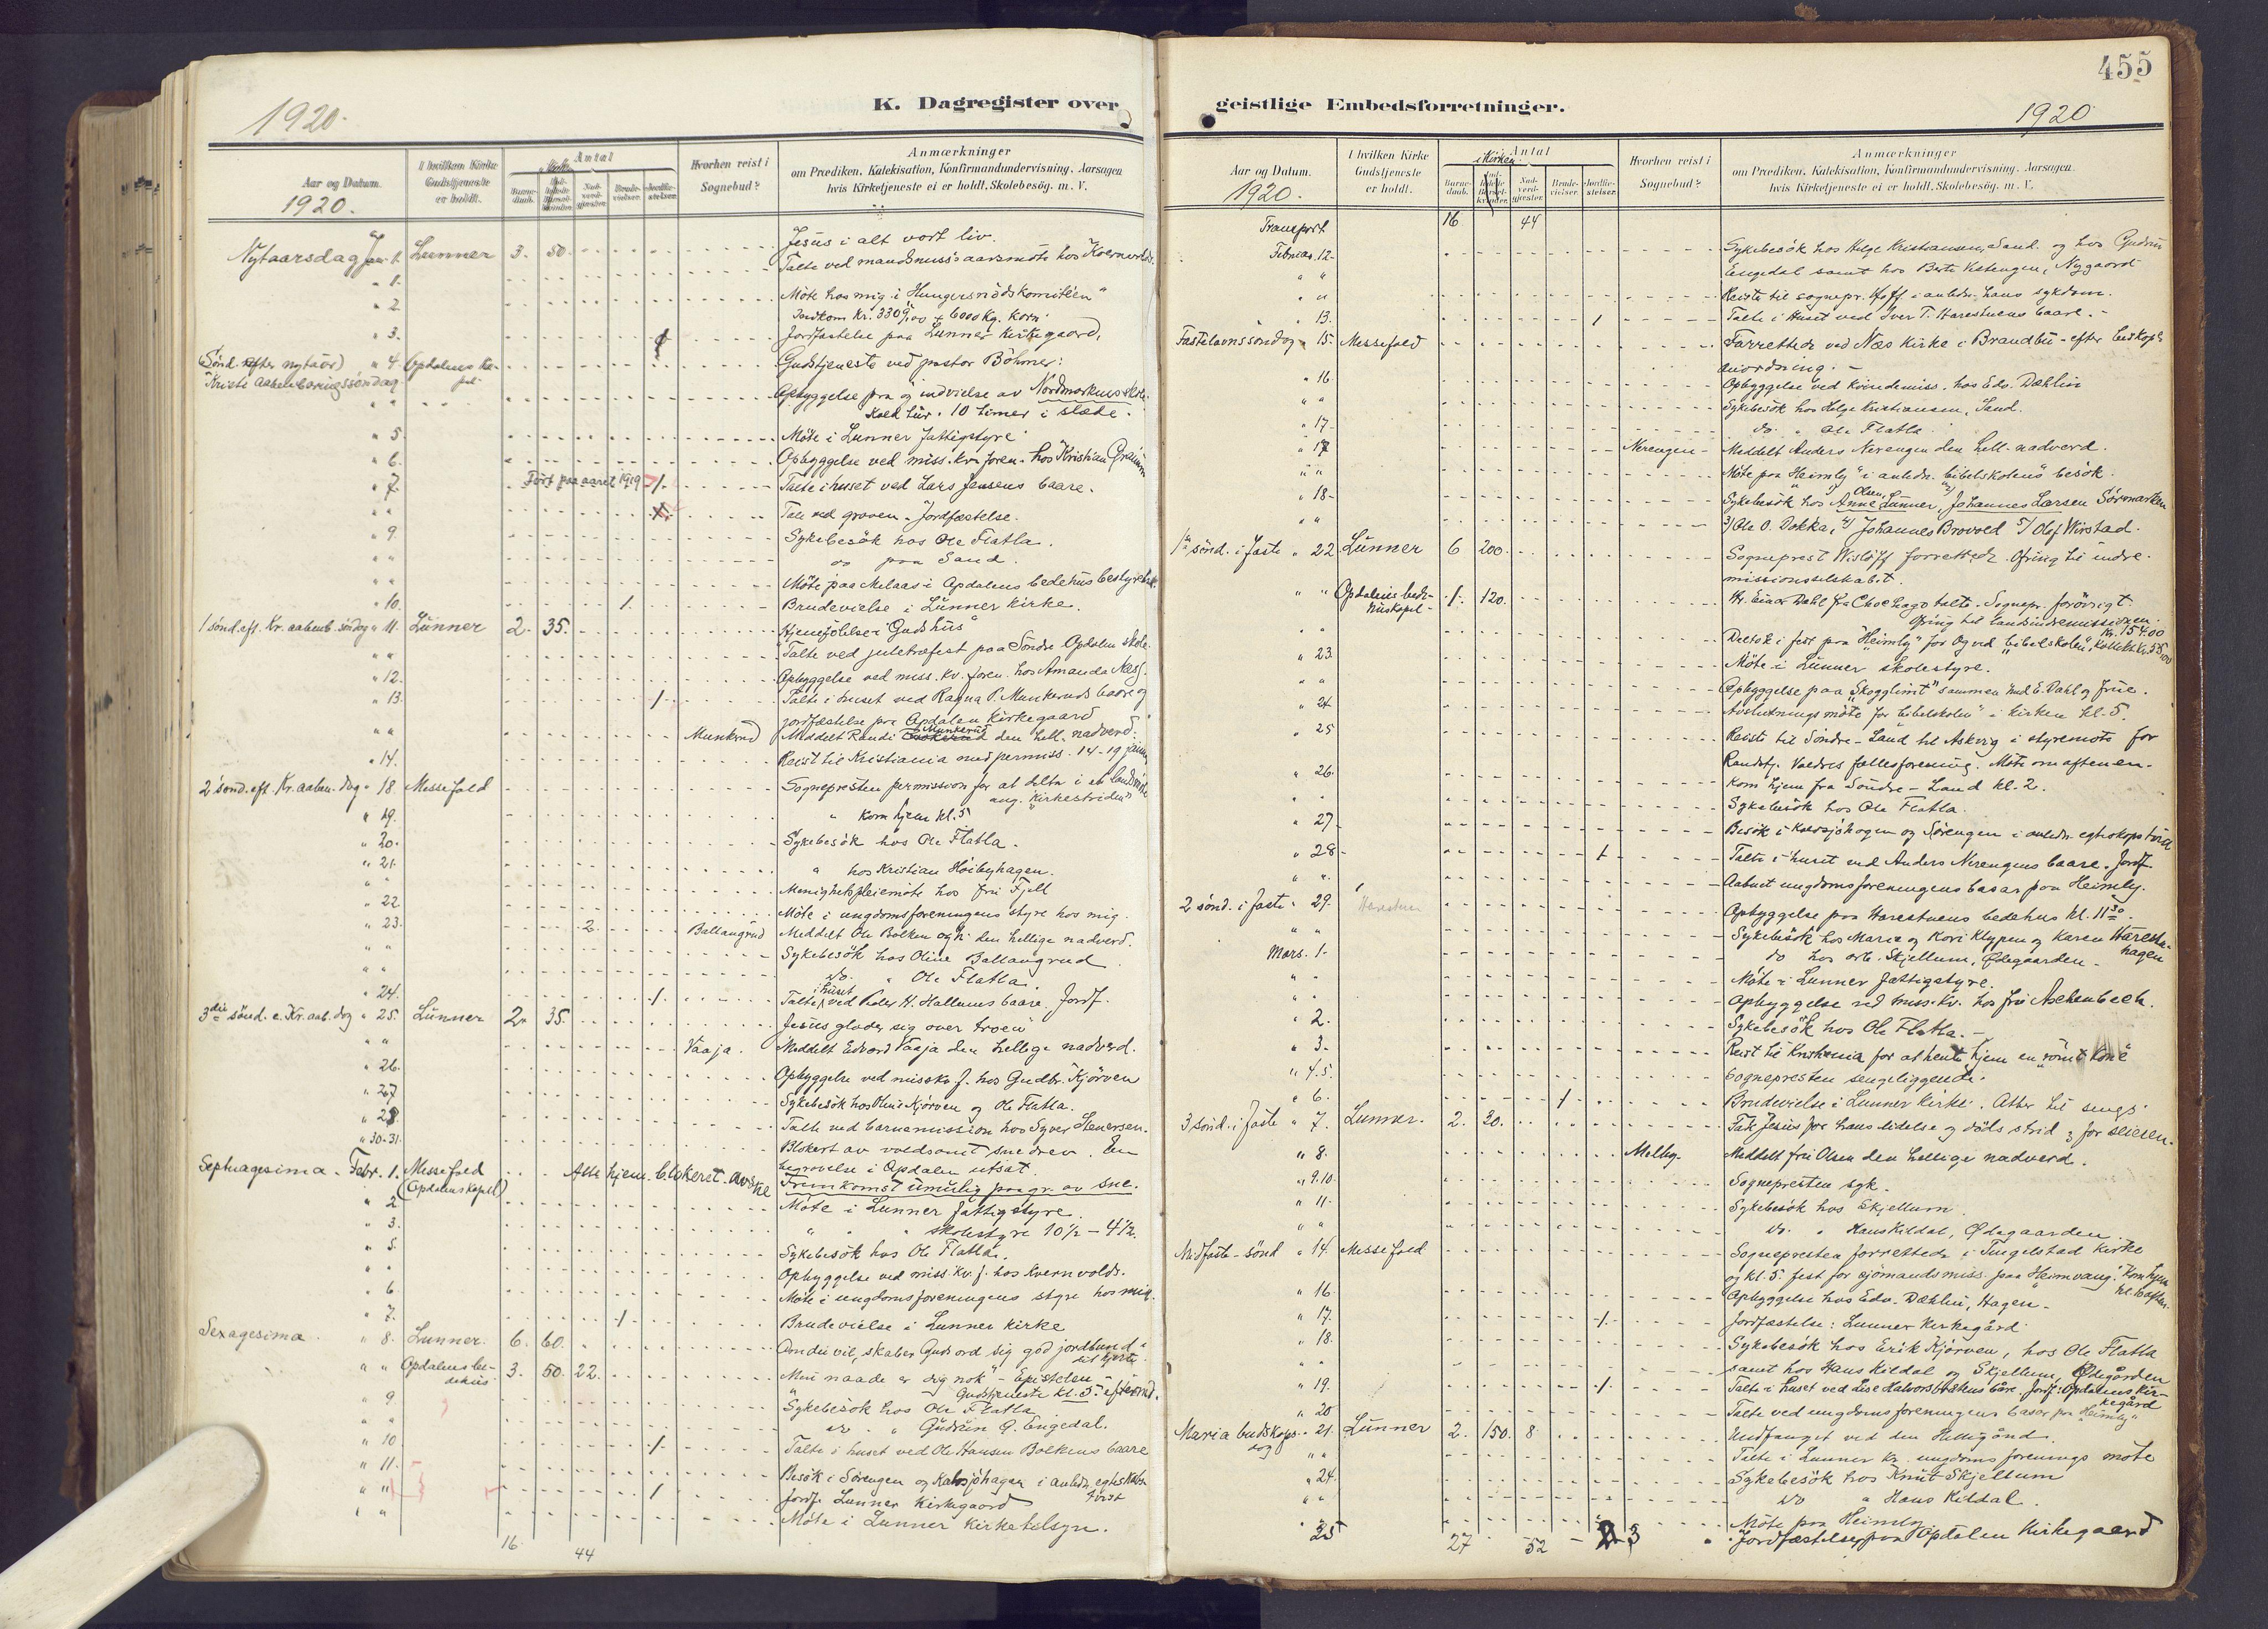 SAH, Lunner prestekontor, H/Ha/Haa/L0001: Ministerialbok nr. 1, 1907-1922, s. 455